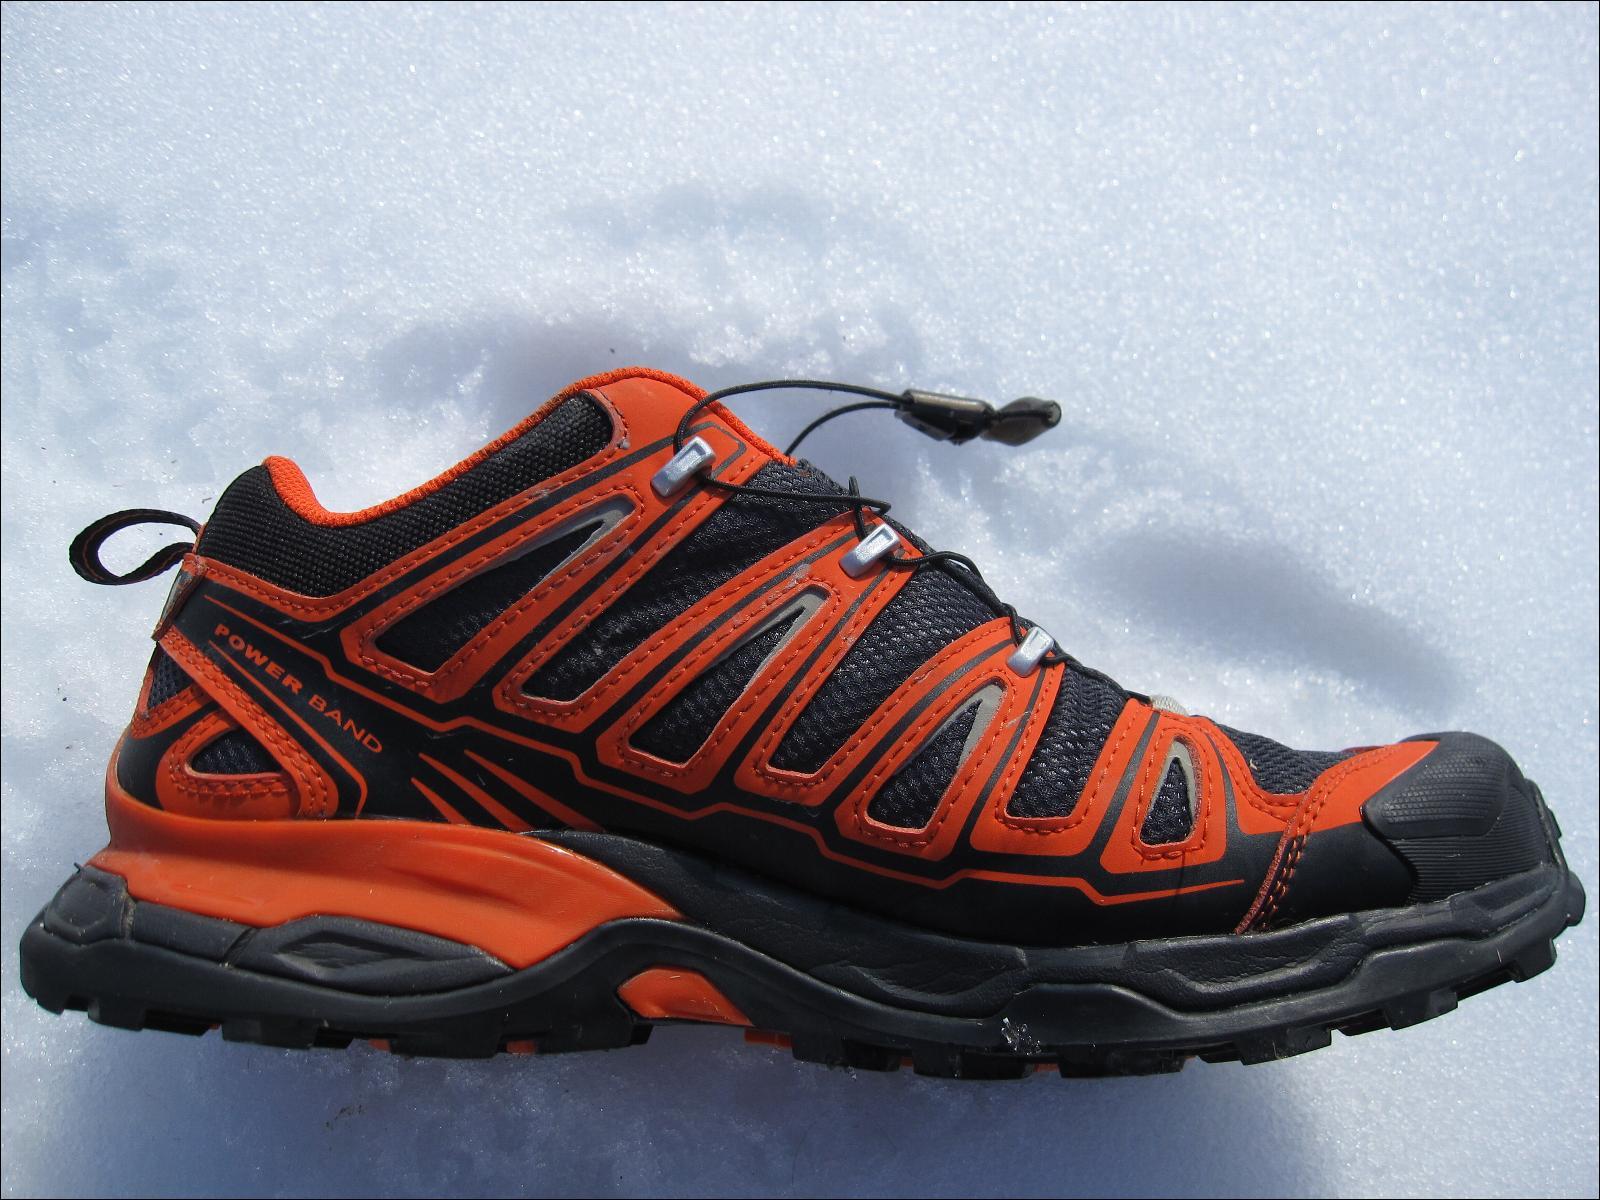 Chaussures Salomon X Ultra GTX